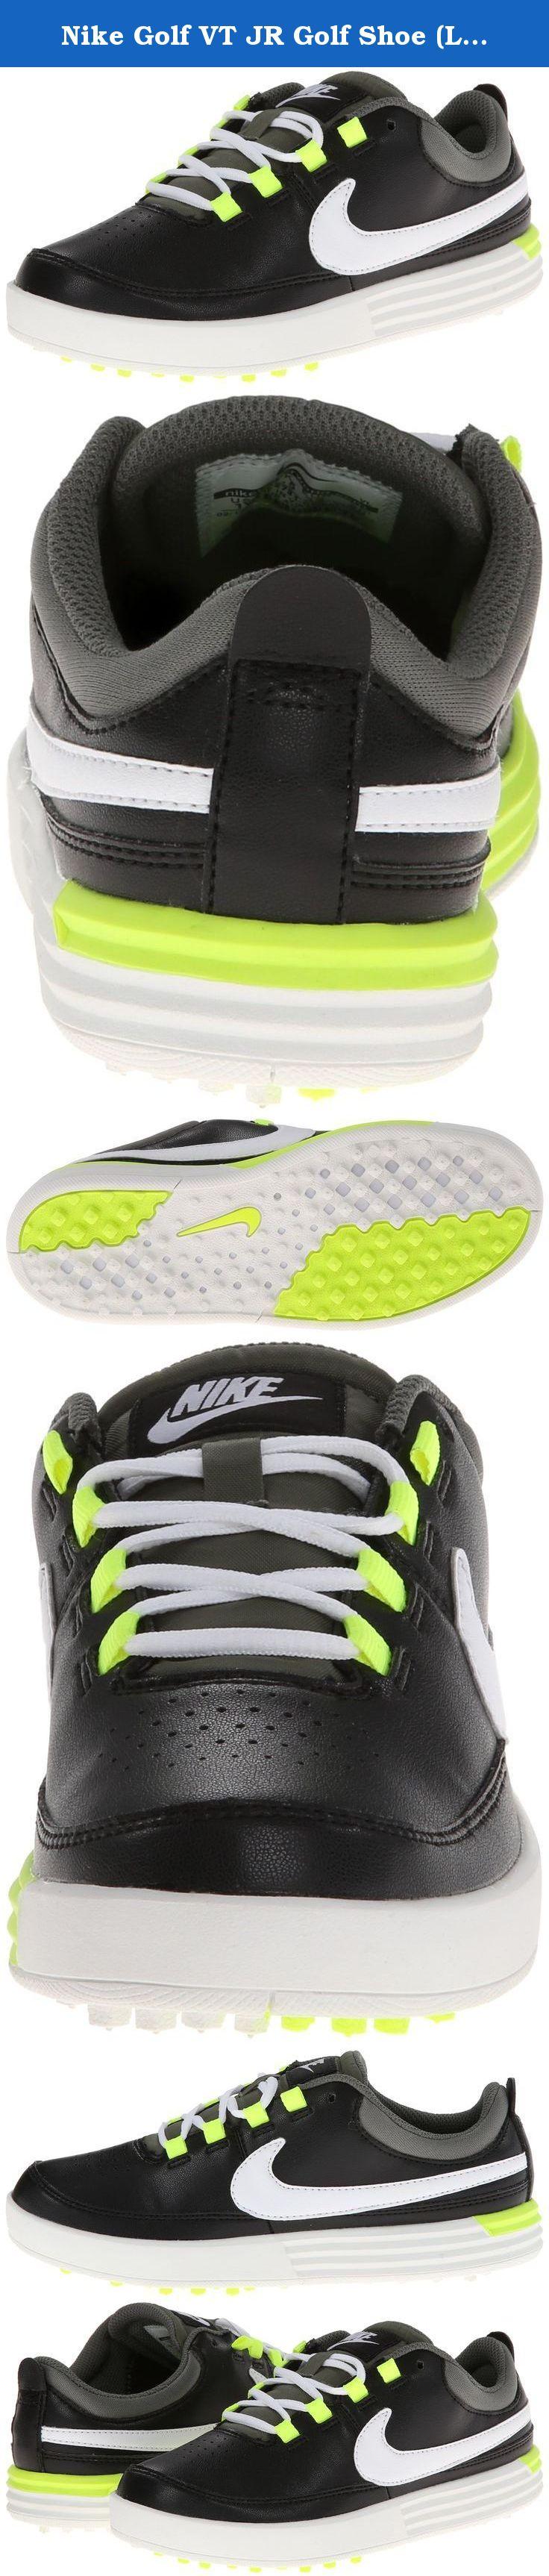 Nike Golf VT JR Golf Shoe (Little Kid Big Kid) A8194 0c28ccaf9914